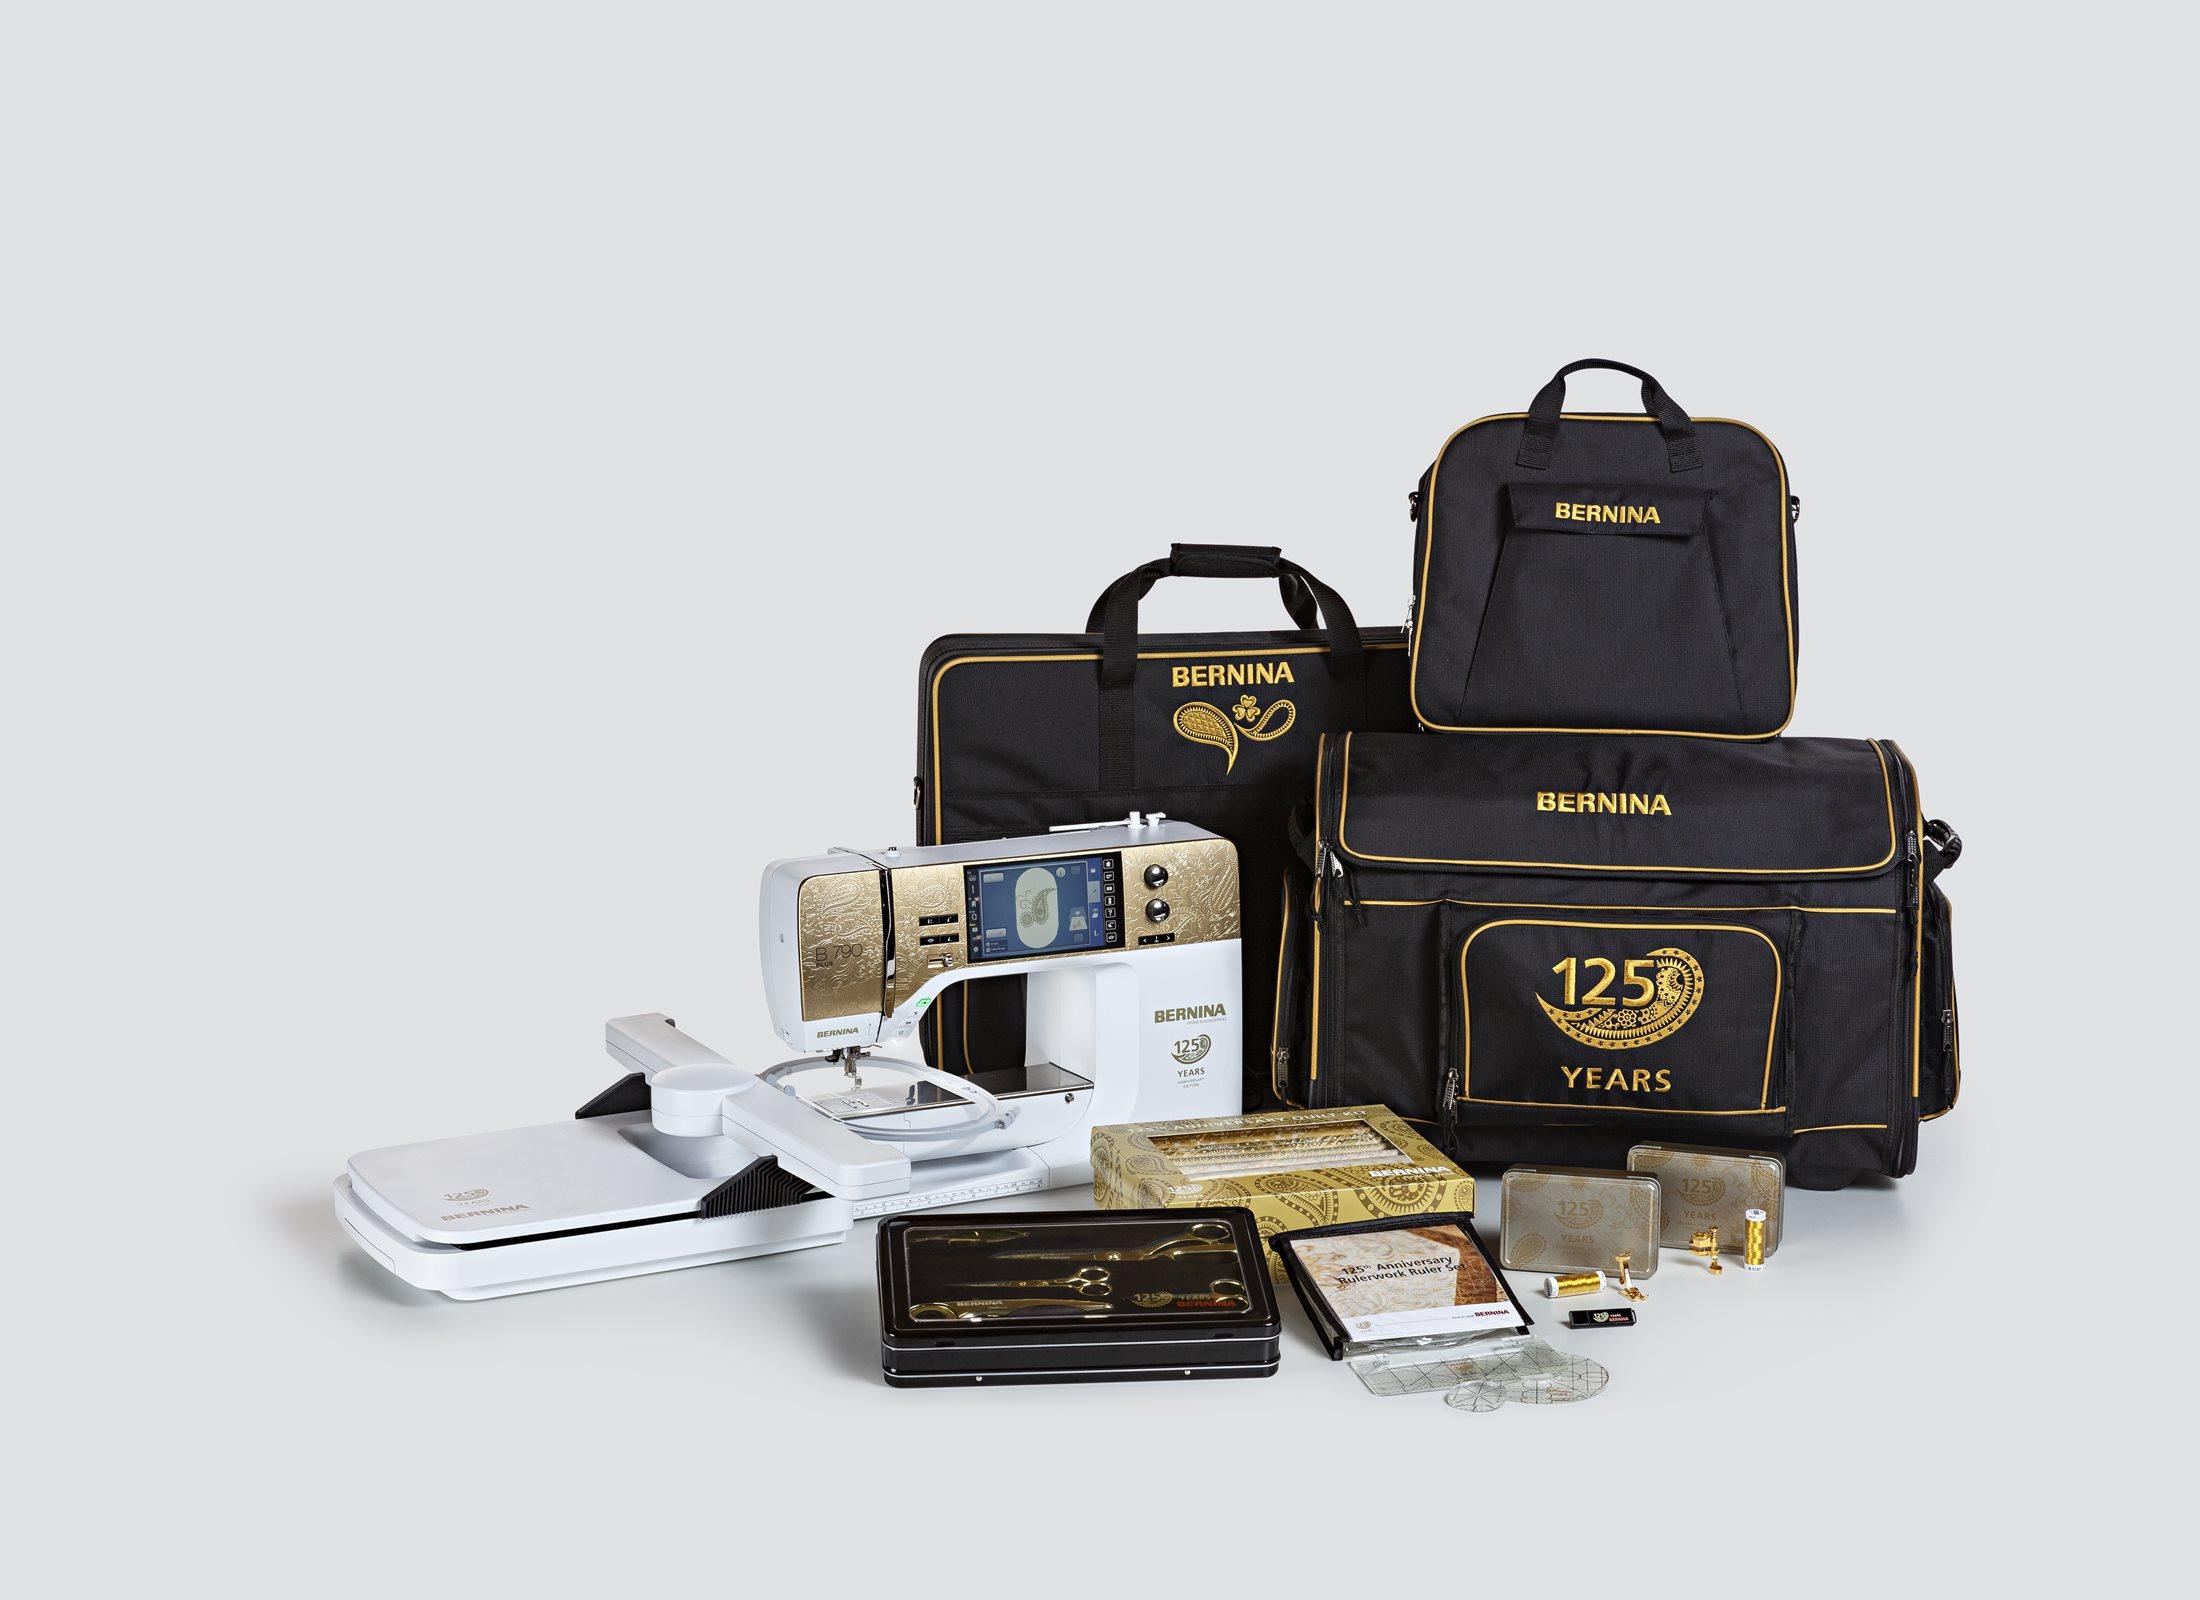 B 790 Plus Anniversary Edition - take home the gold! - BERNINA 33d335cfbf2a7